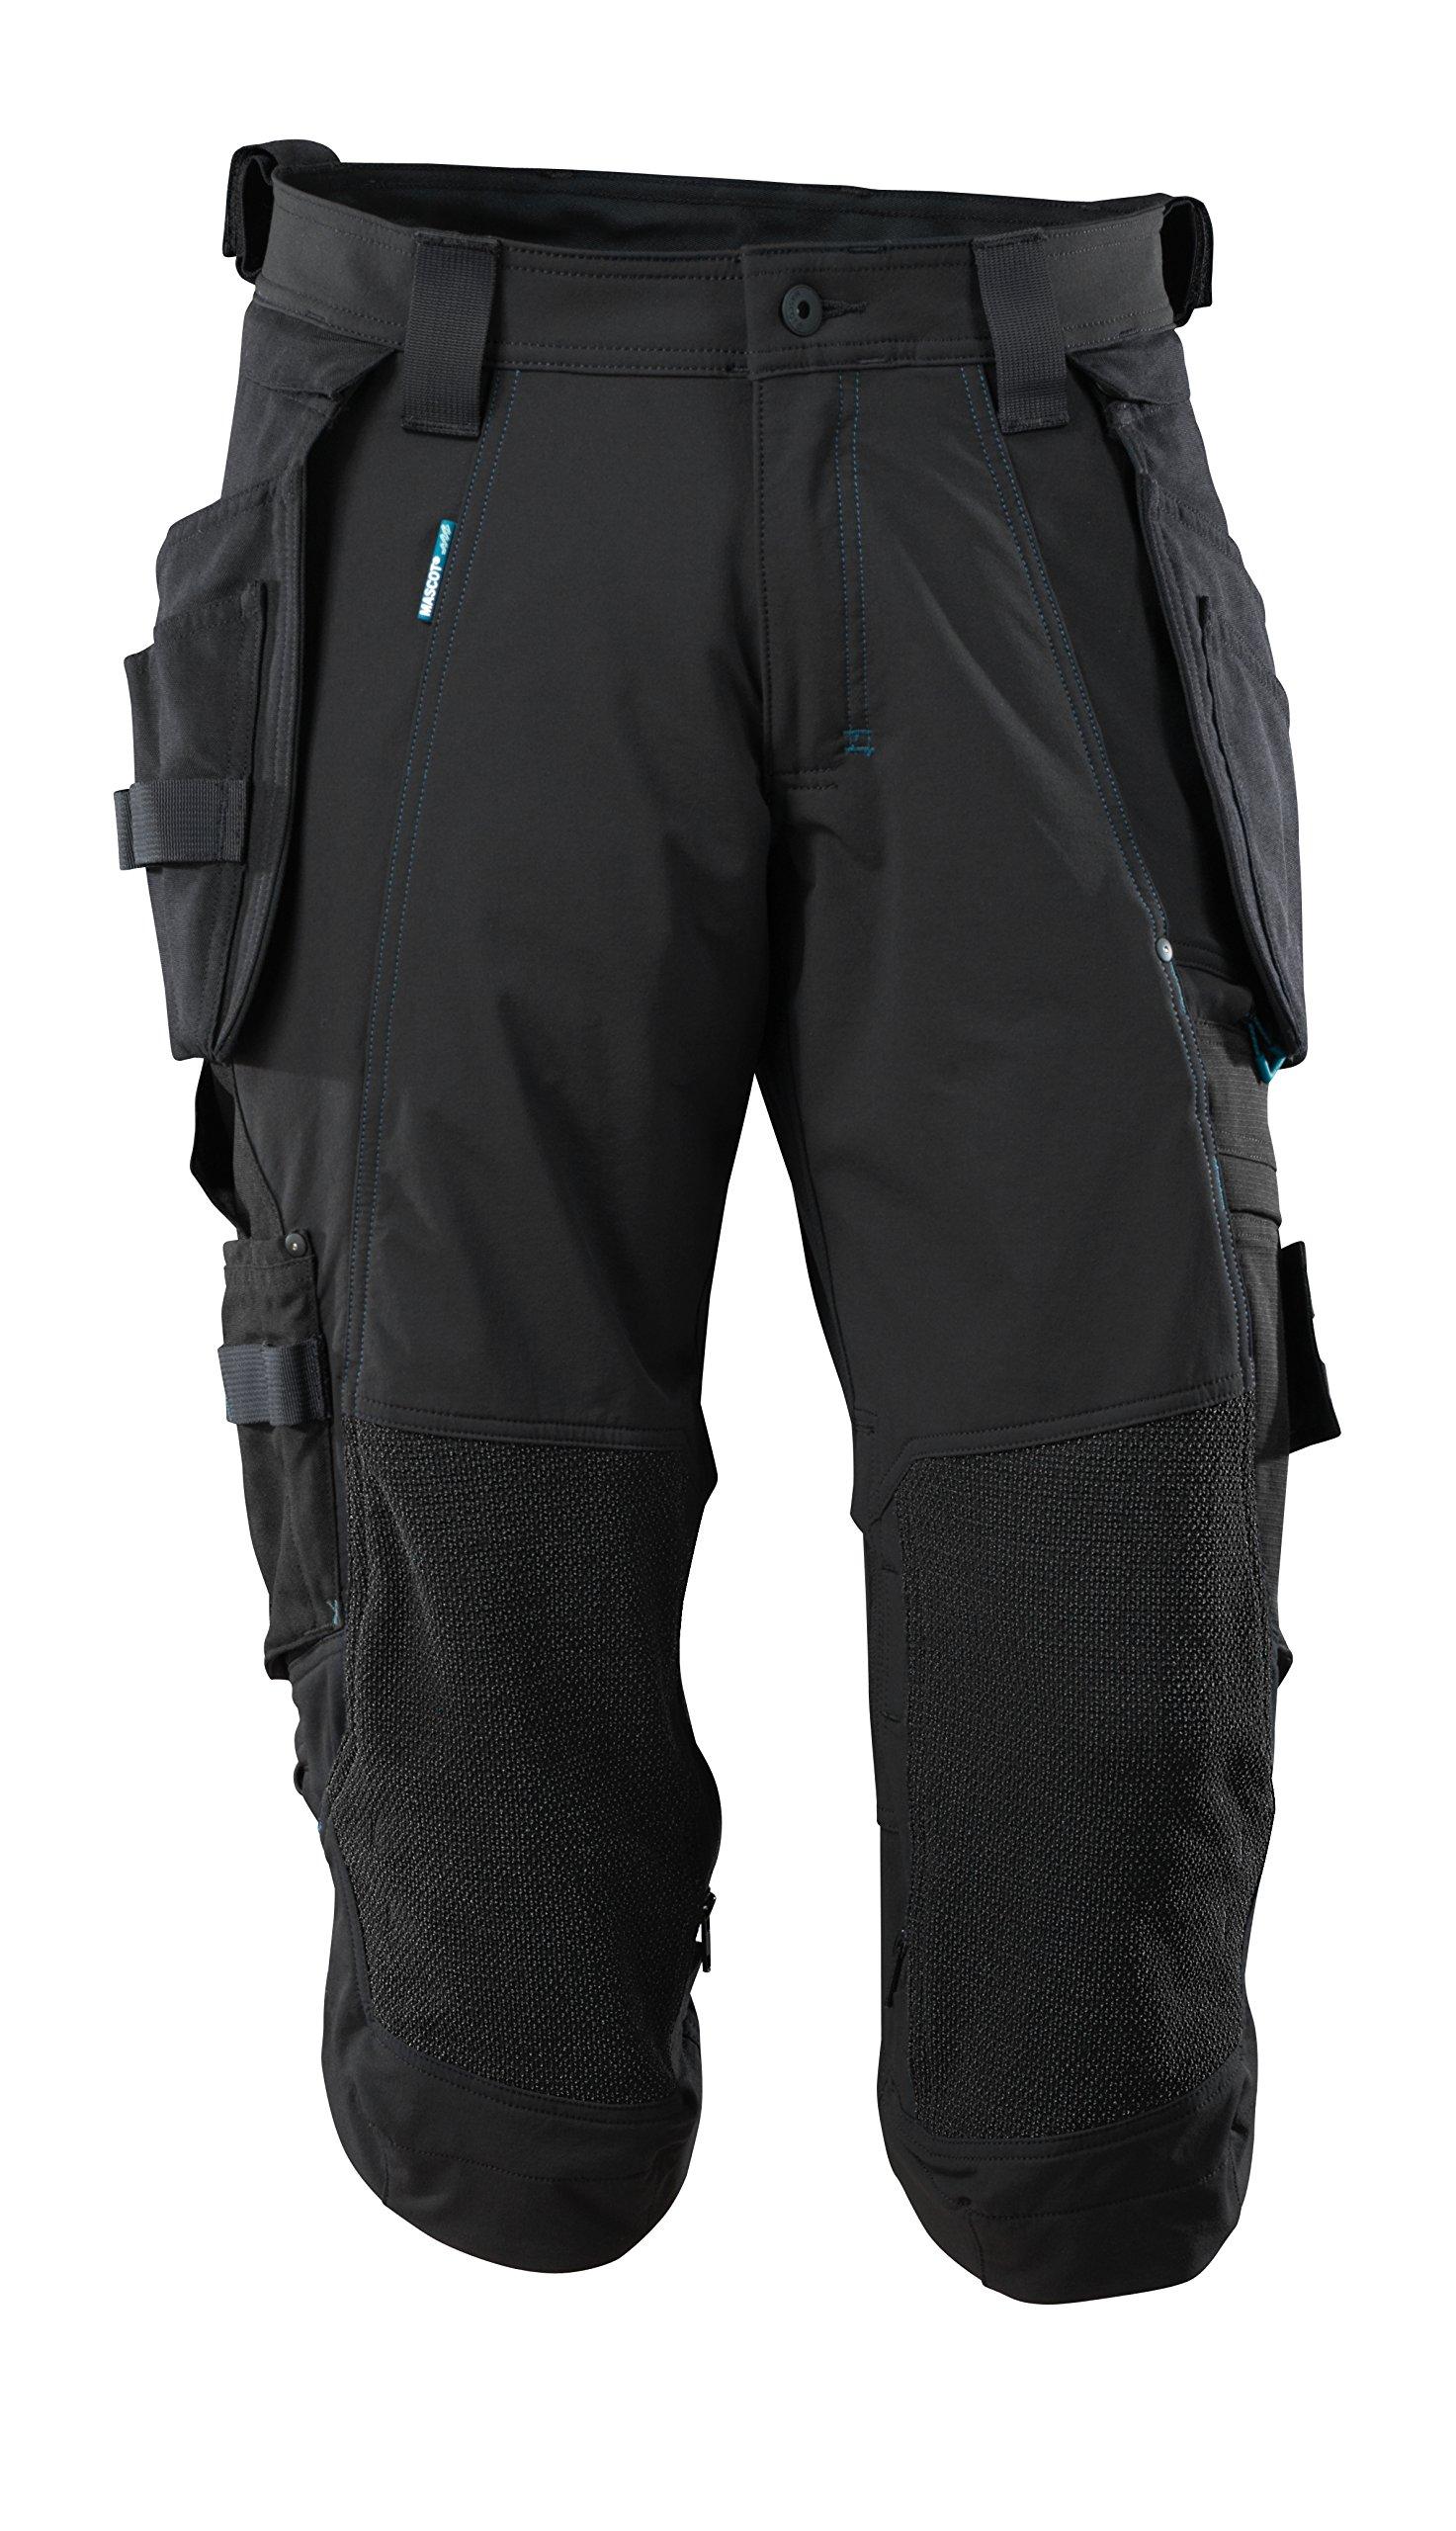 Mascot 17049-311-09-C64 Stretch Shorts Size C64, Black